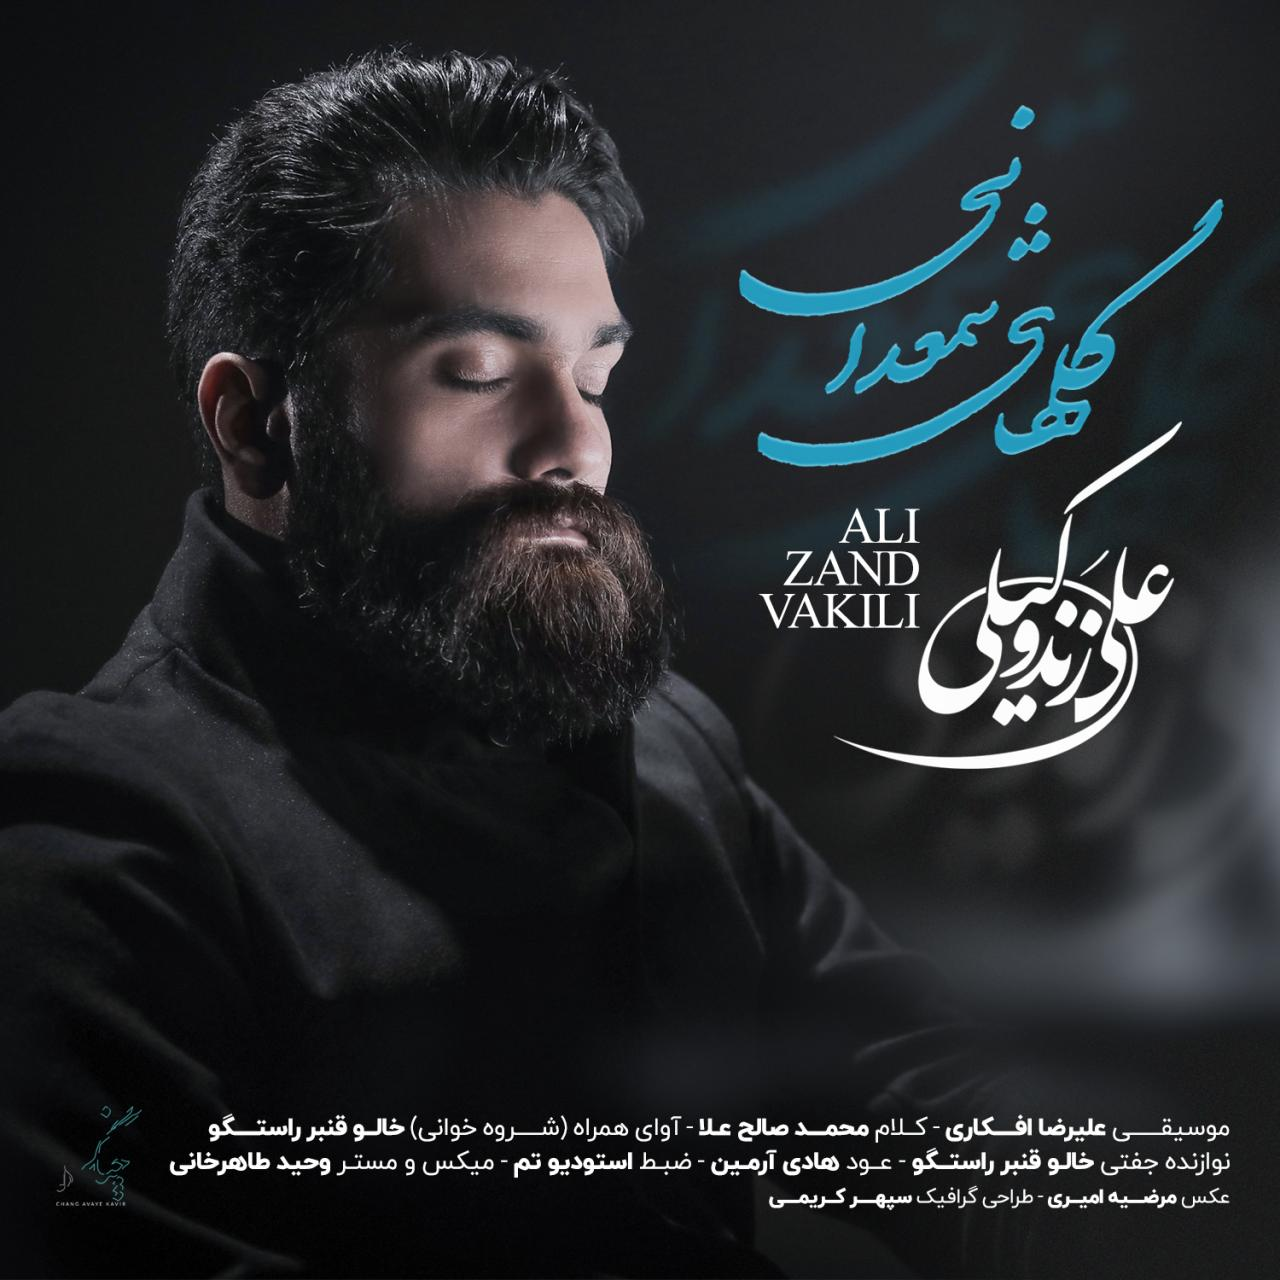 Ali Zand Vakili - Golhaye Shamdani - دانلود آهنگ علی زند وکیلی به نام گلهای شمعدانی